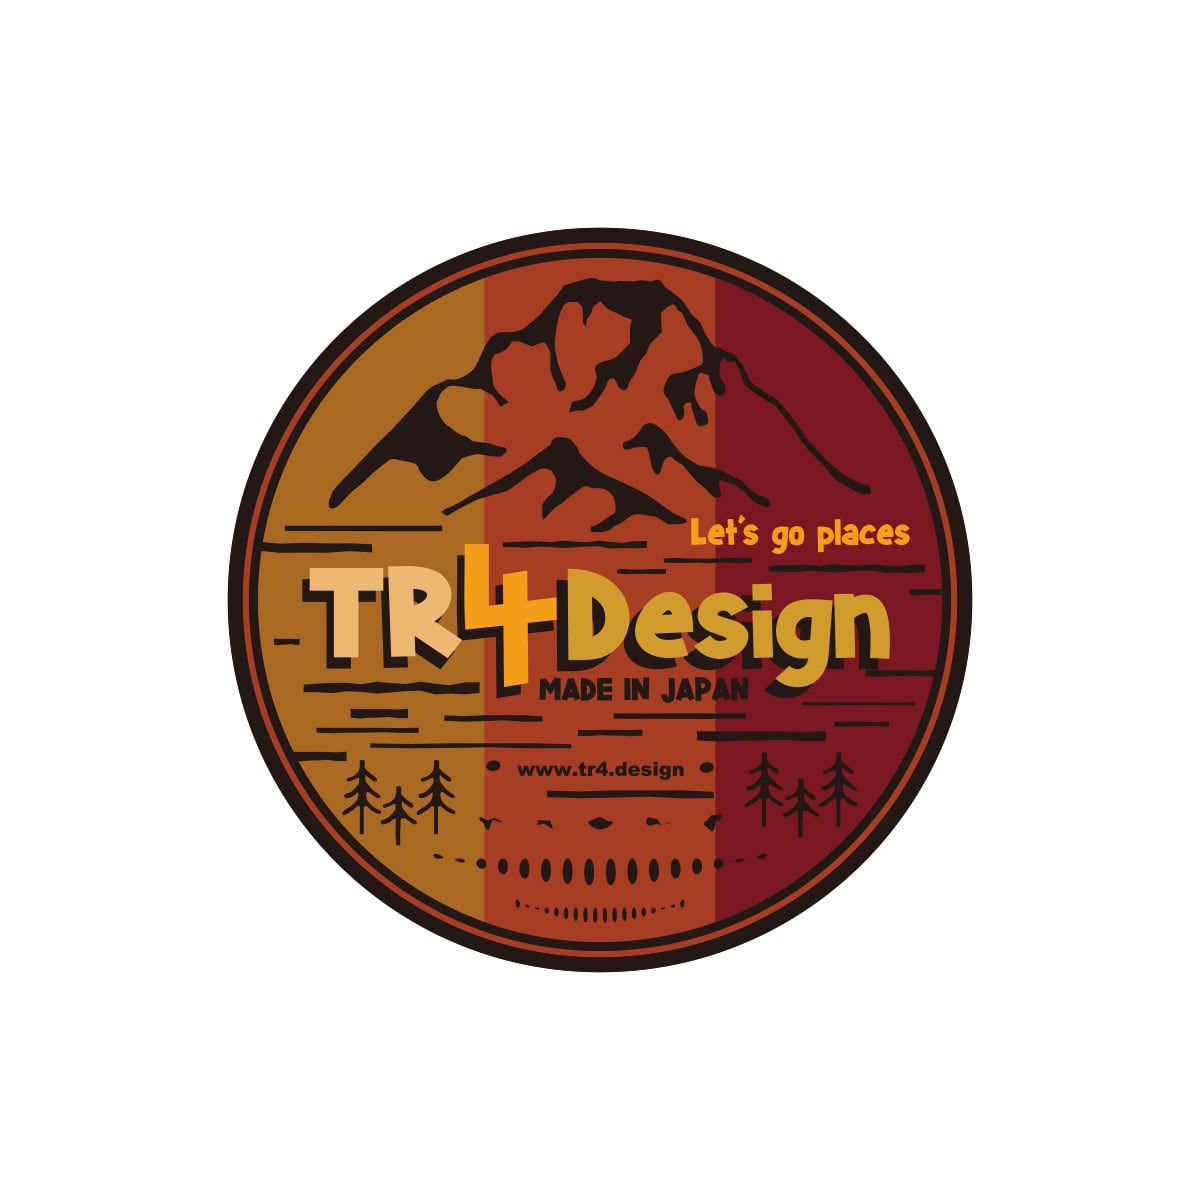 【 TR4Design 】TR4Design Sticker Decal #05